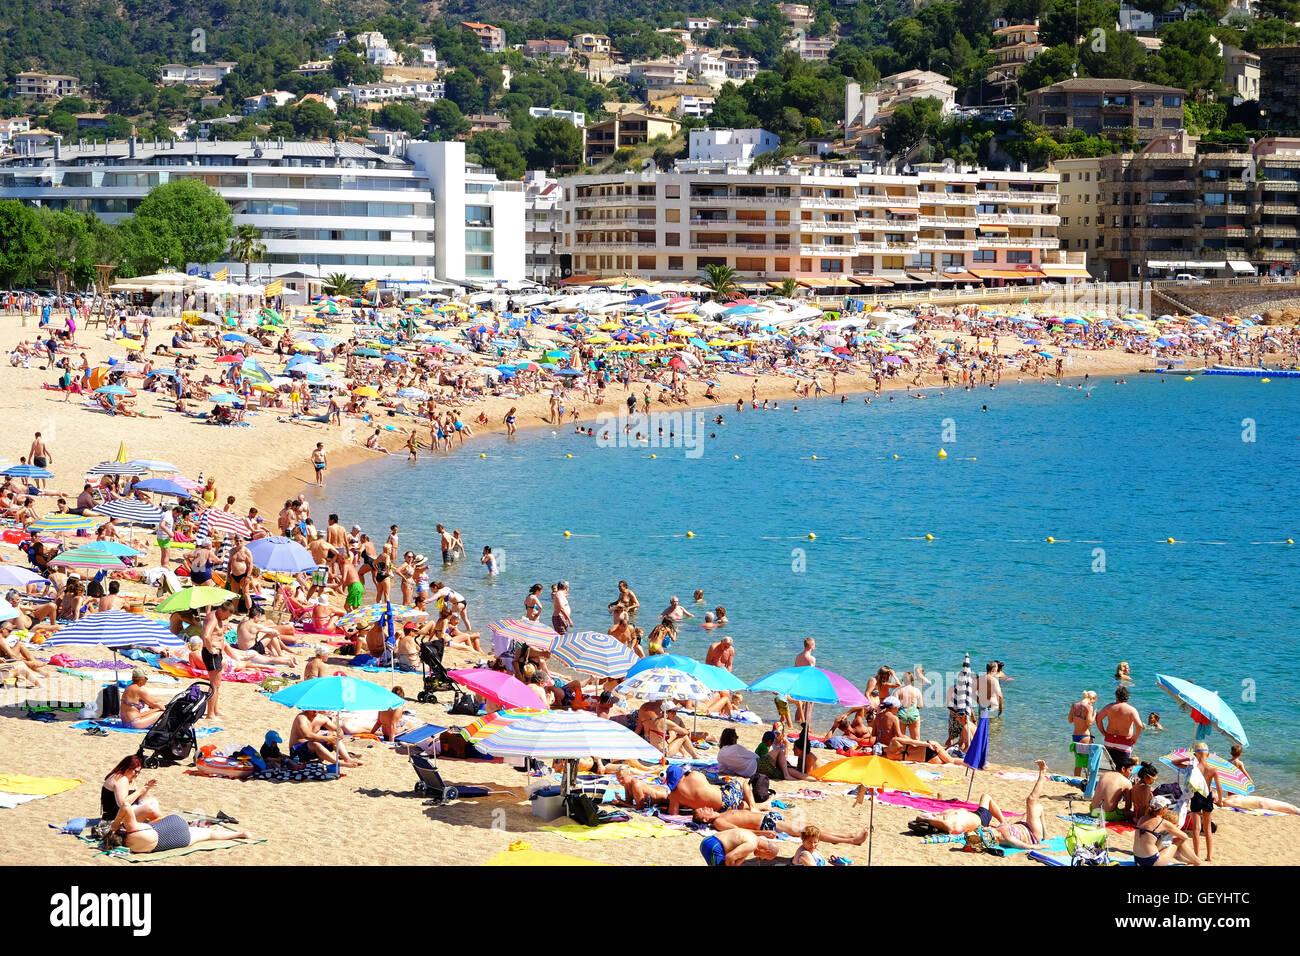 Tossa de Mar, Costa Brava, Spain - Stock Image